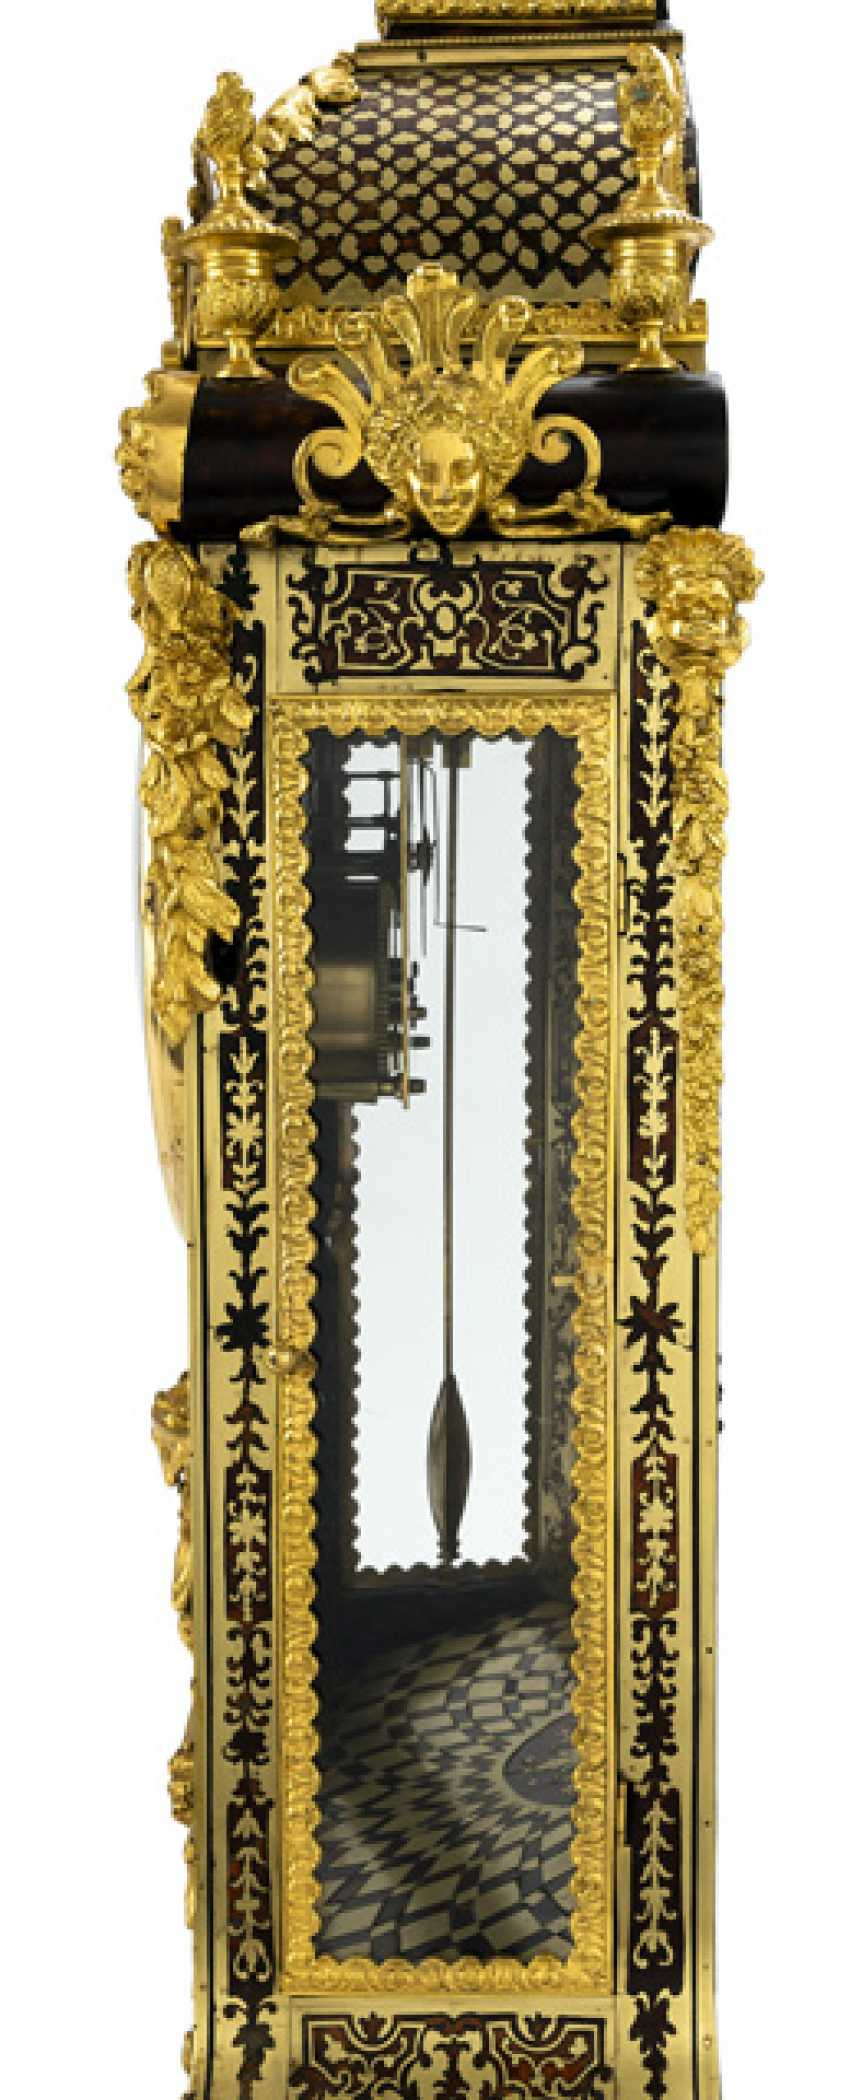 Pomp pendule. Factory Baltazar Paris, France, referred to, 18. Century - photo 2